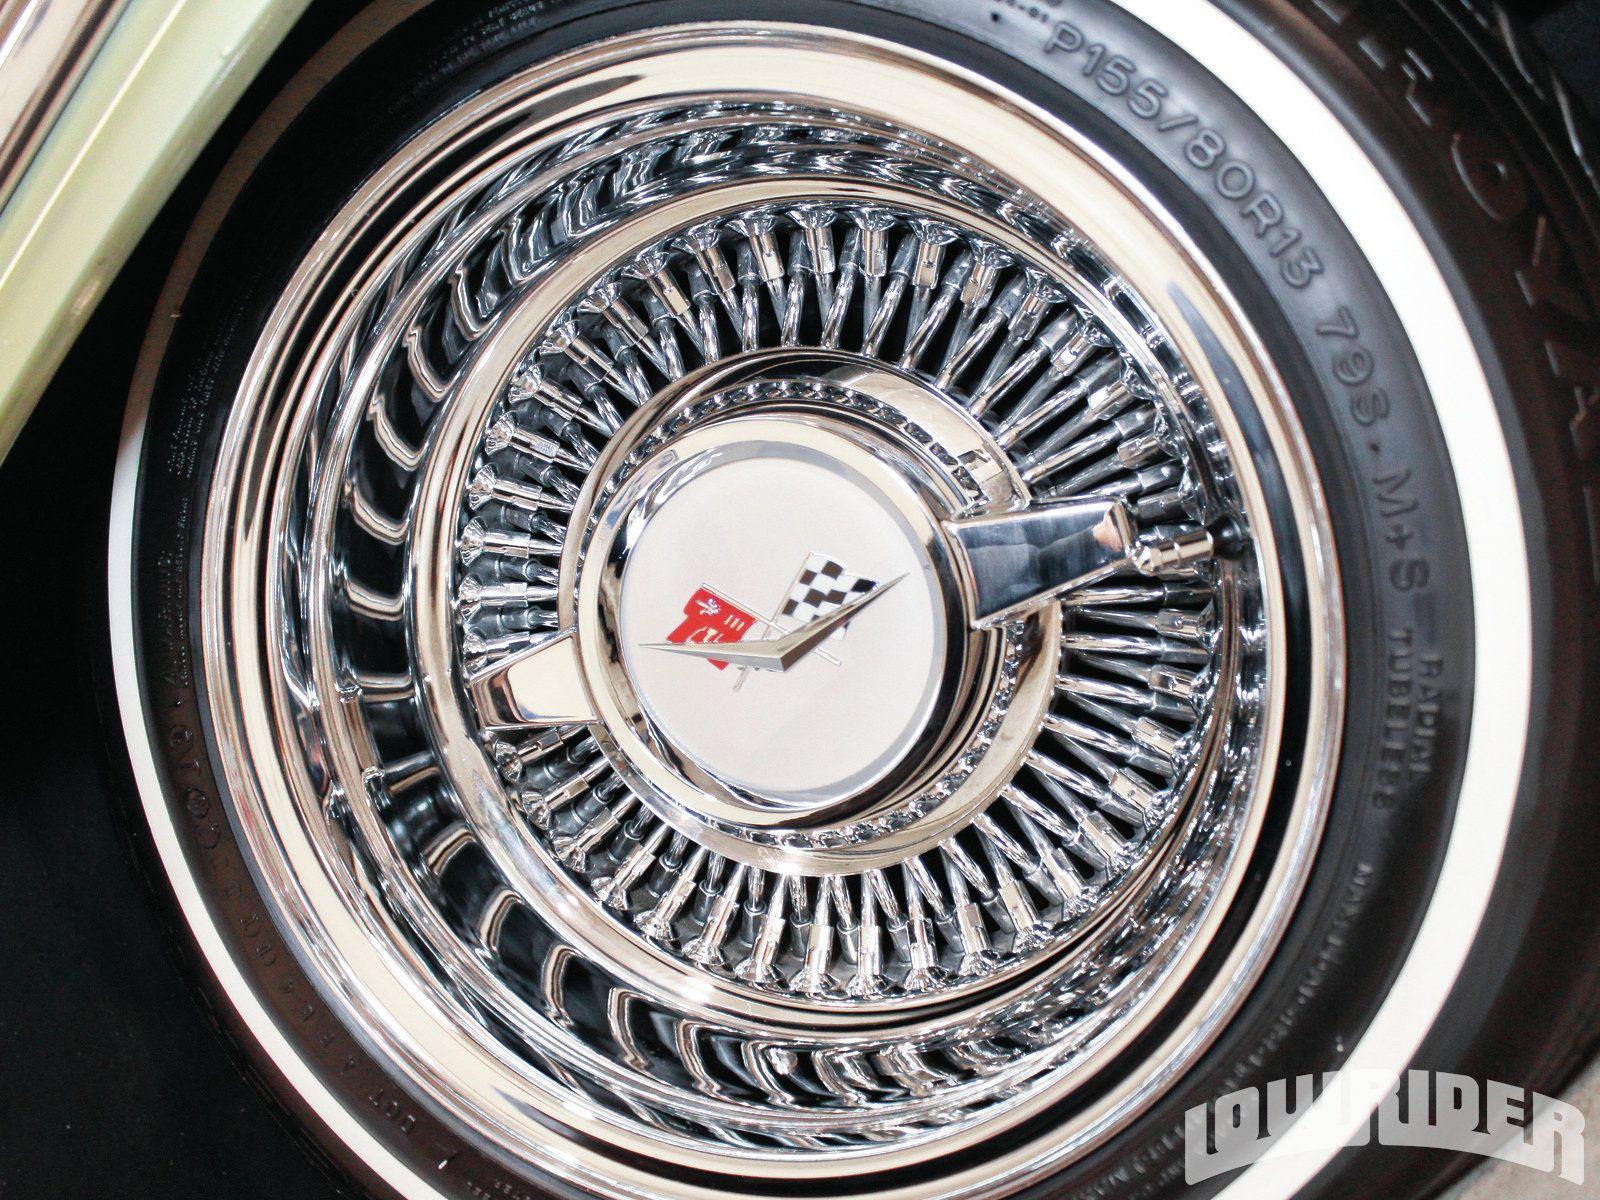 1959 Chevrolet Impala 13 Inch Tru Ray Spoke Rims Photo 13 Rims